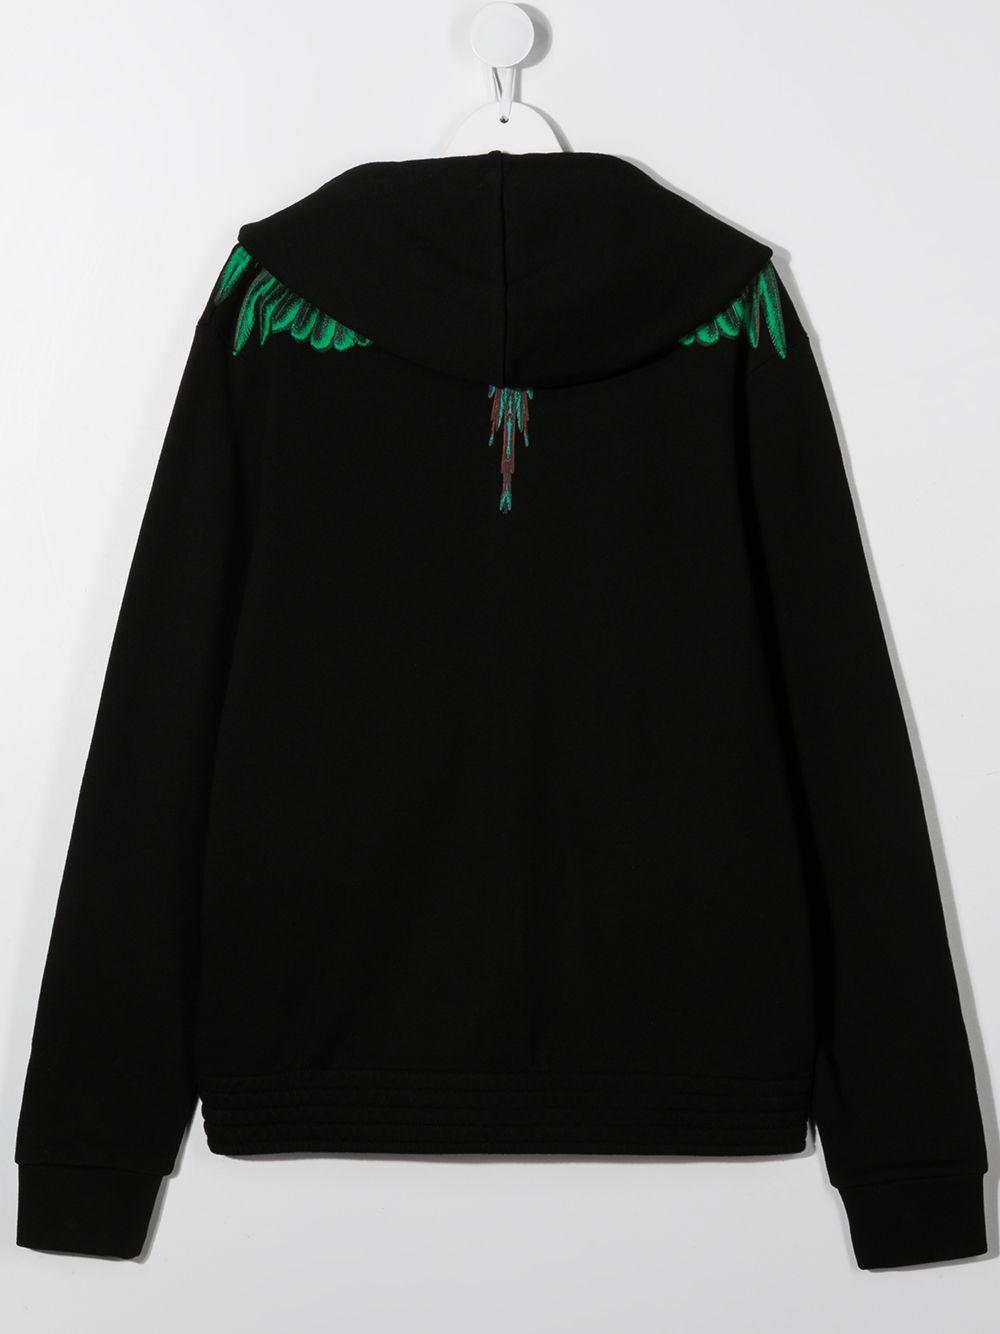 Marcelo burlon | Sweatshirt | MB22040020B010T